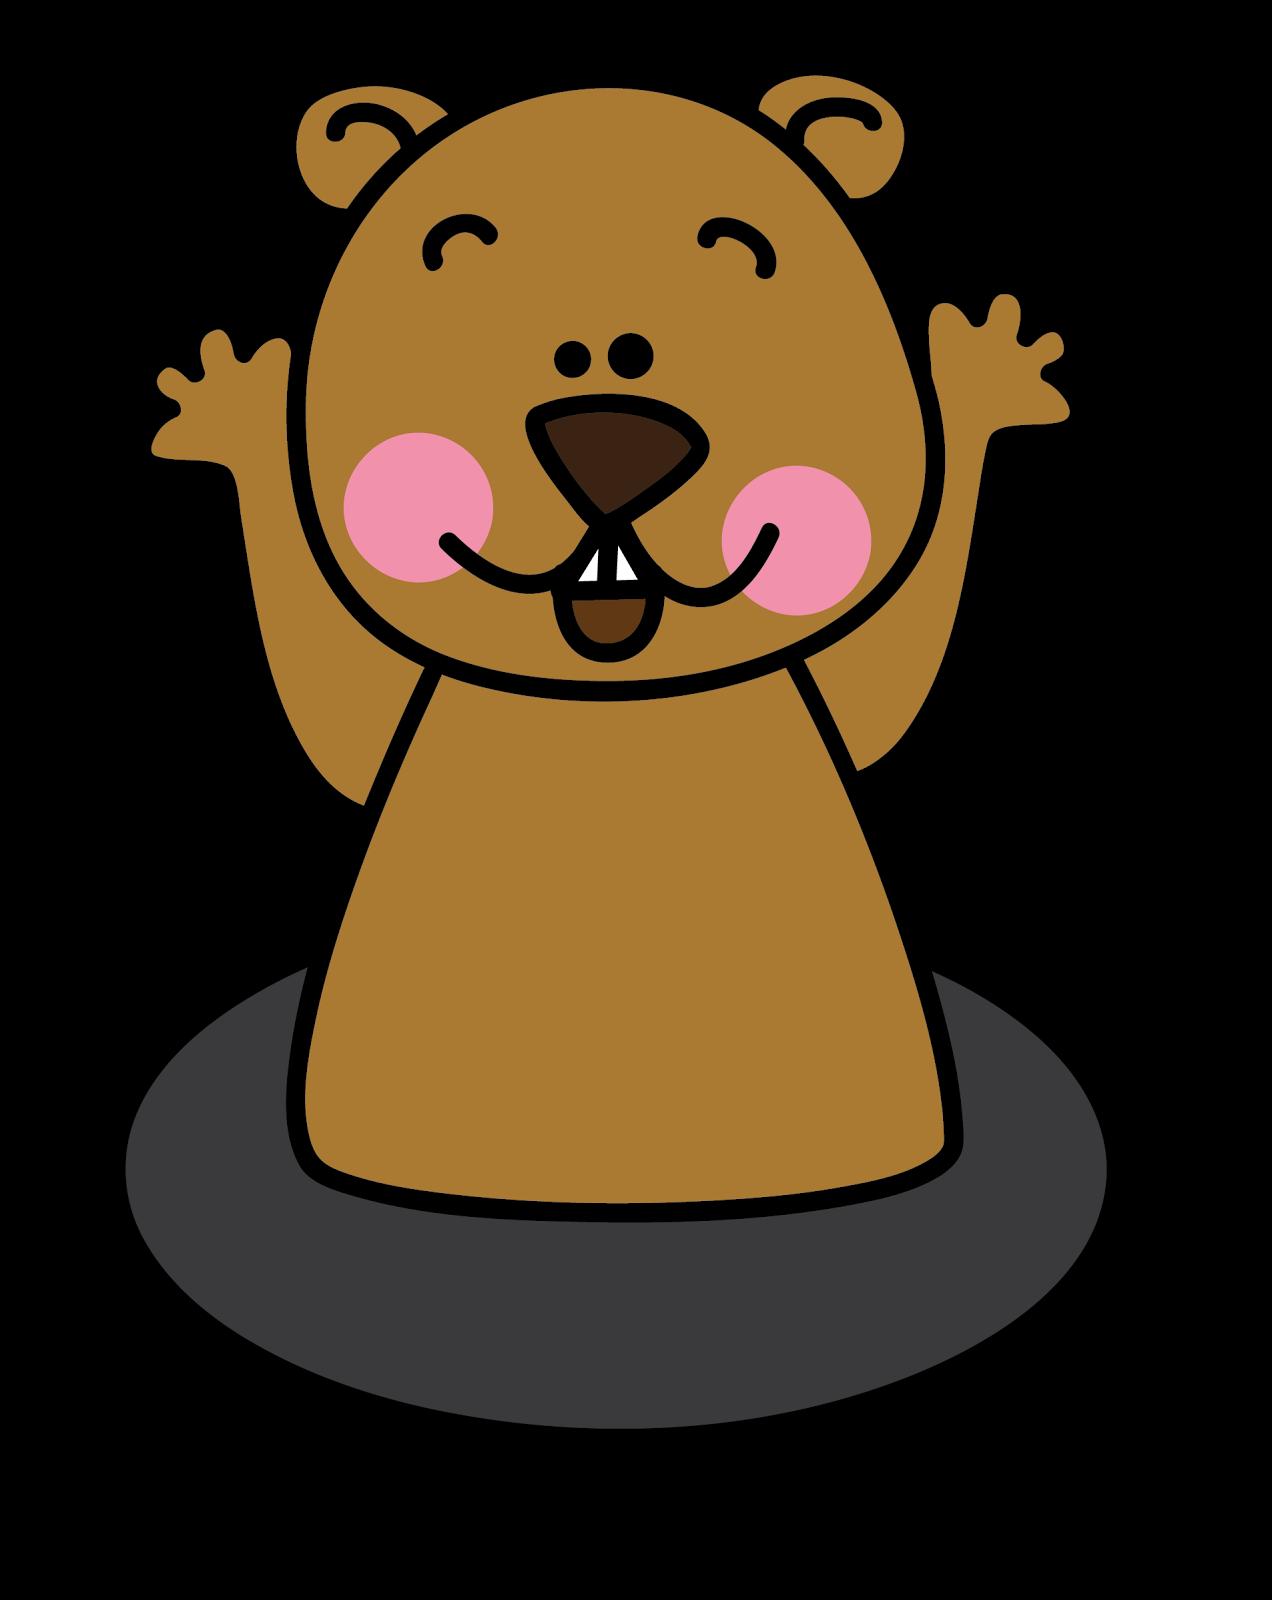 Free Groundhog Clipart-Free Groundhog Clipart-8